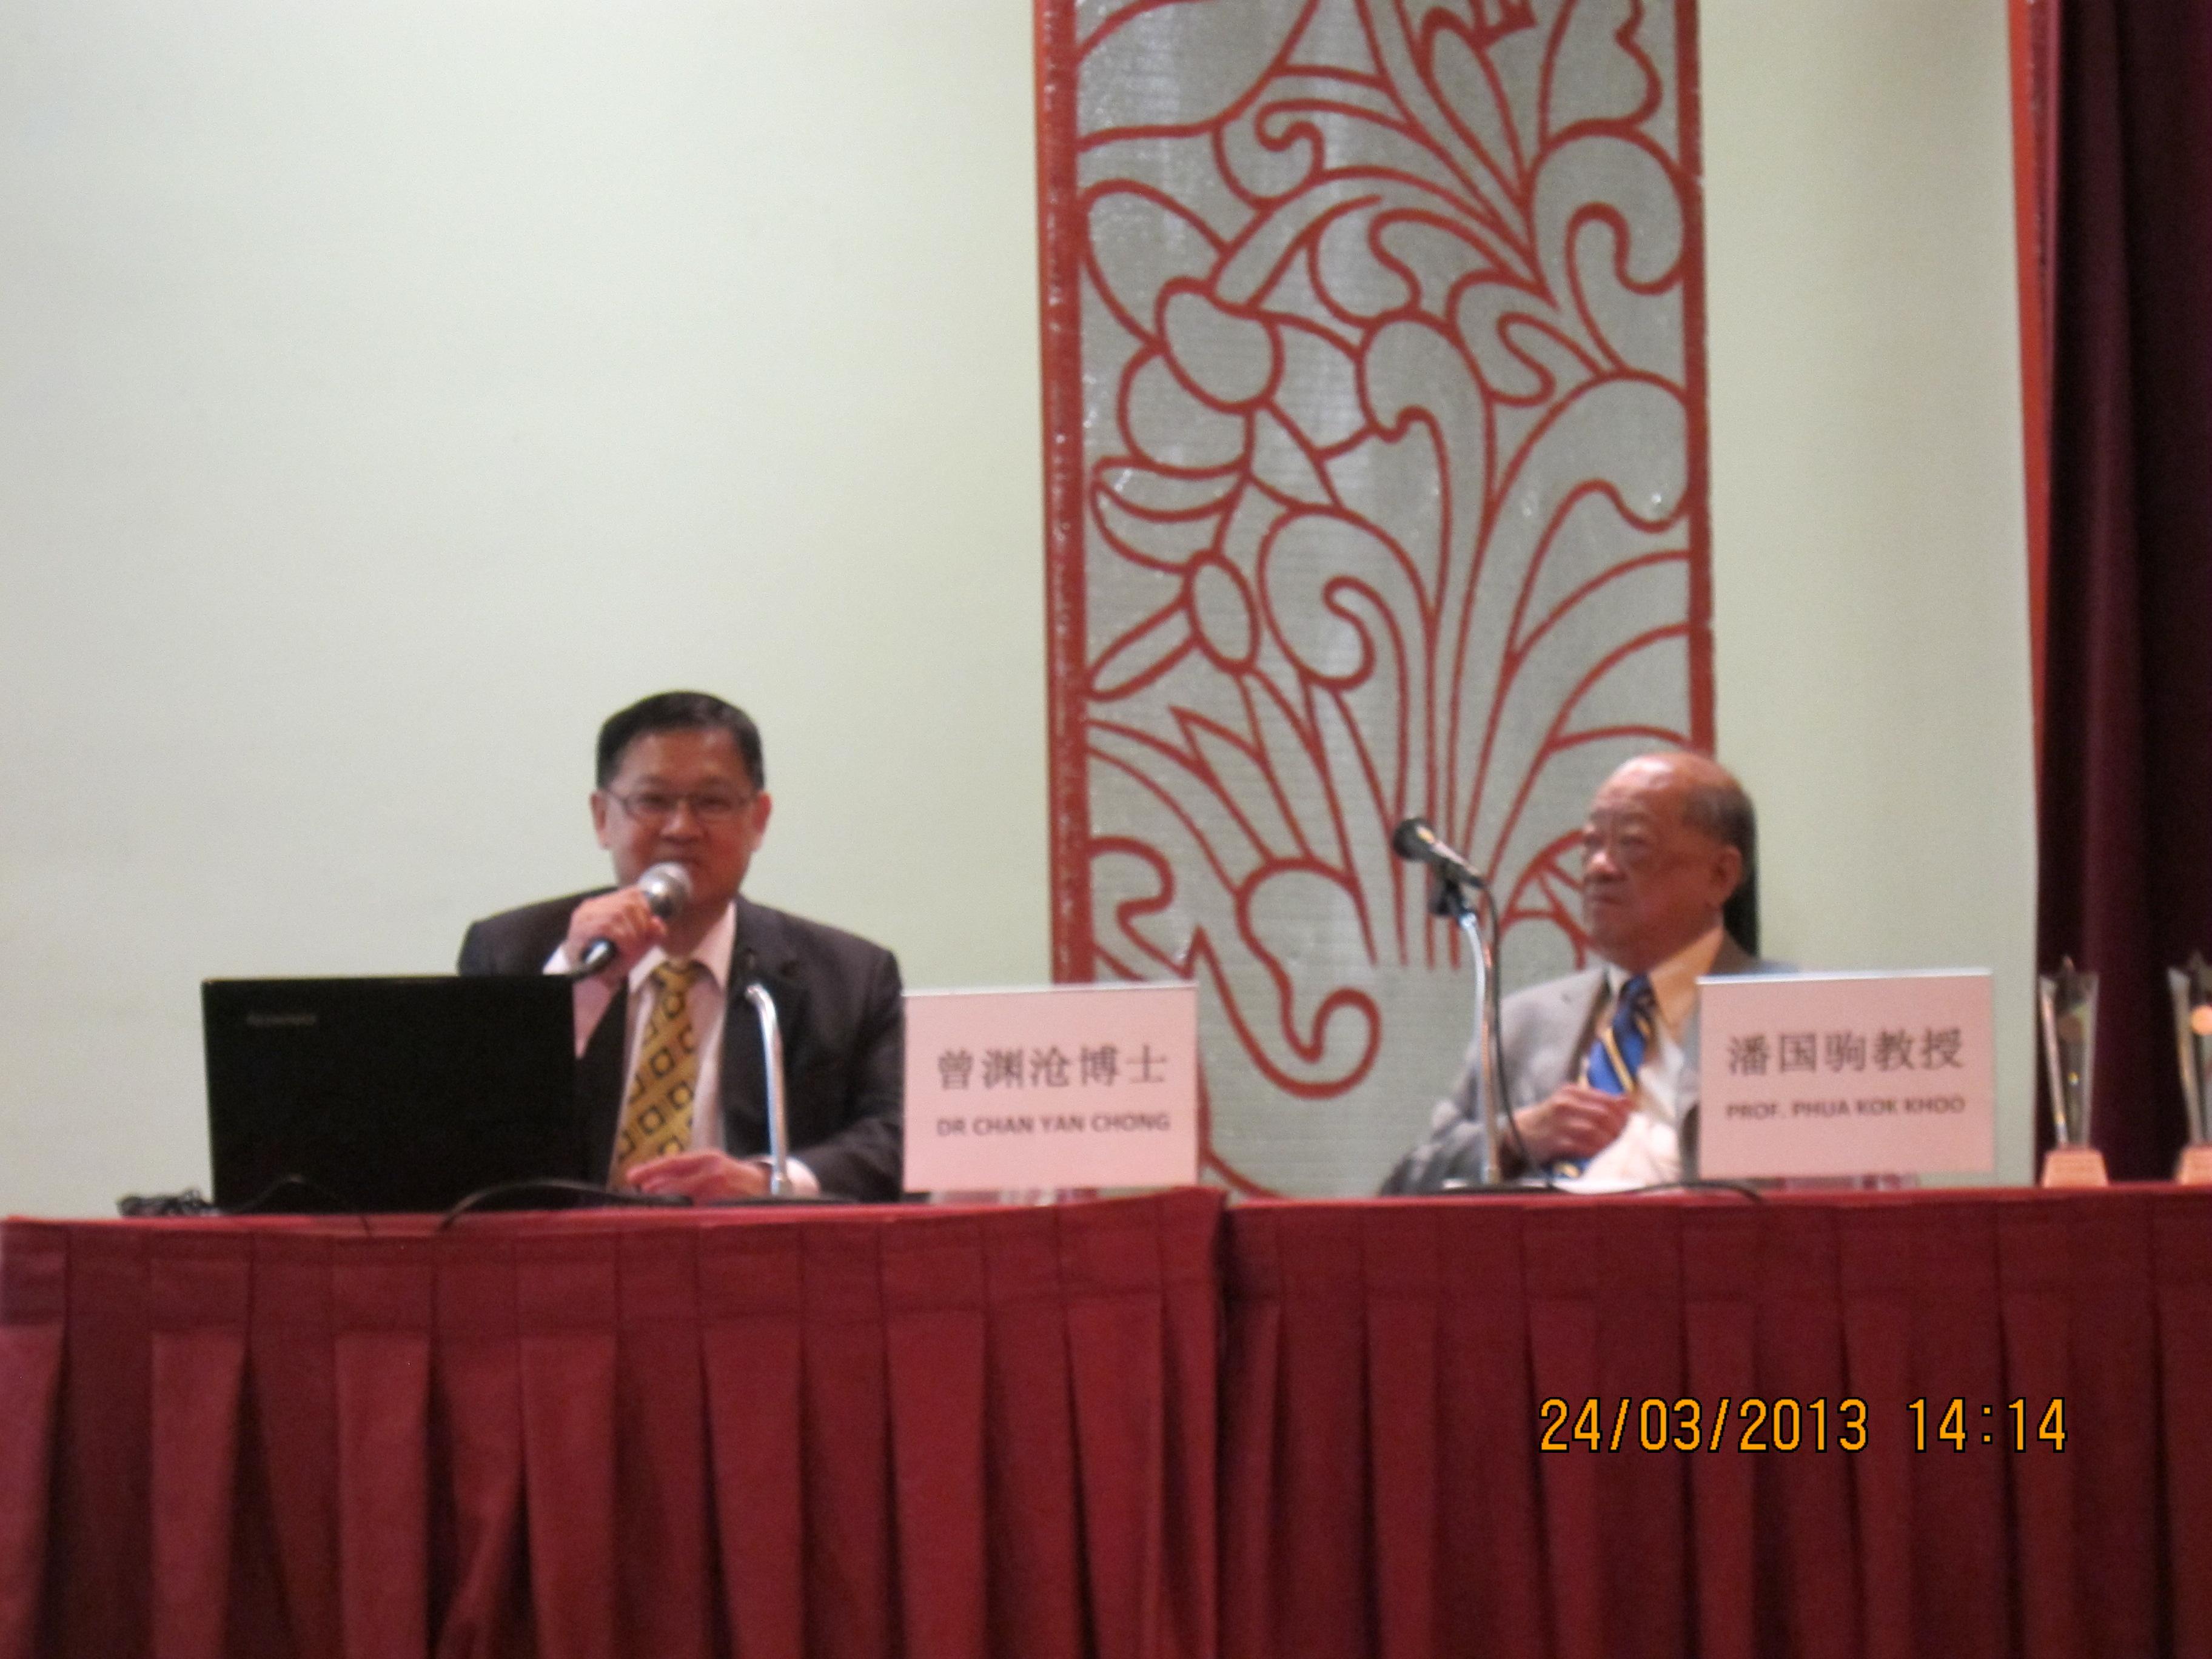 Other - 24 Mar 2013 Teochew Federation (Singapore) (39)